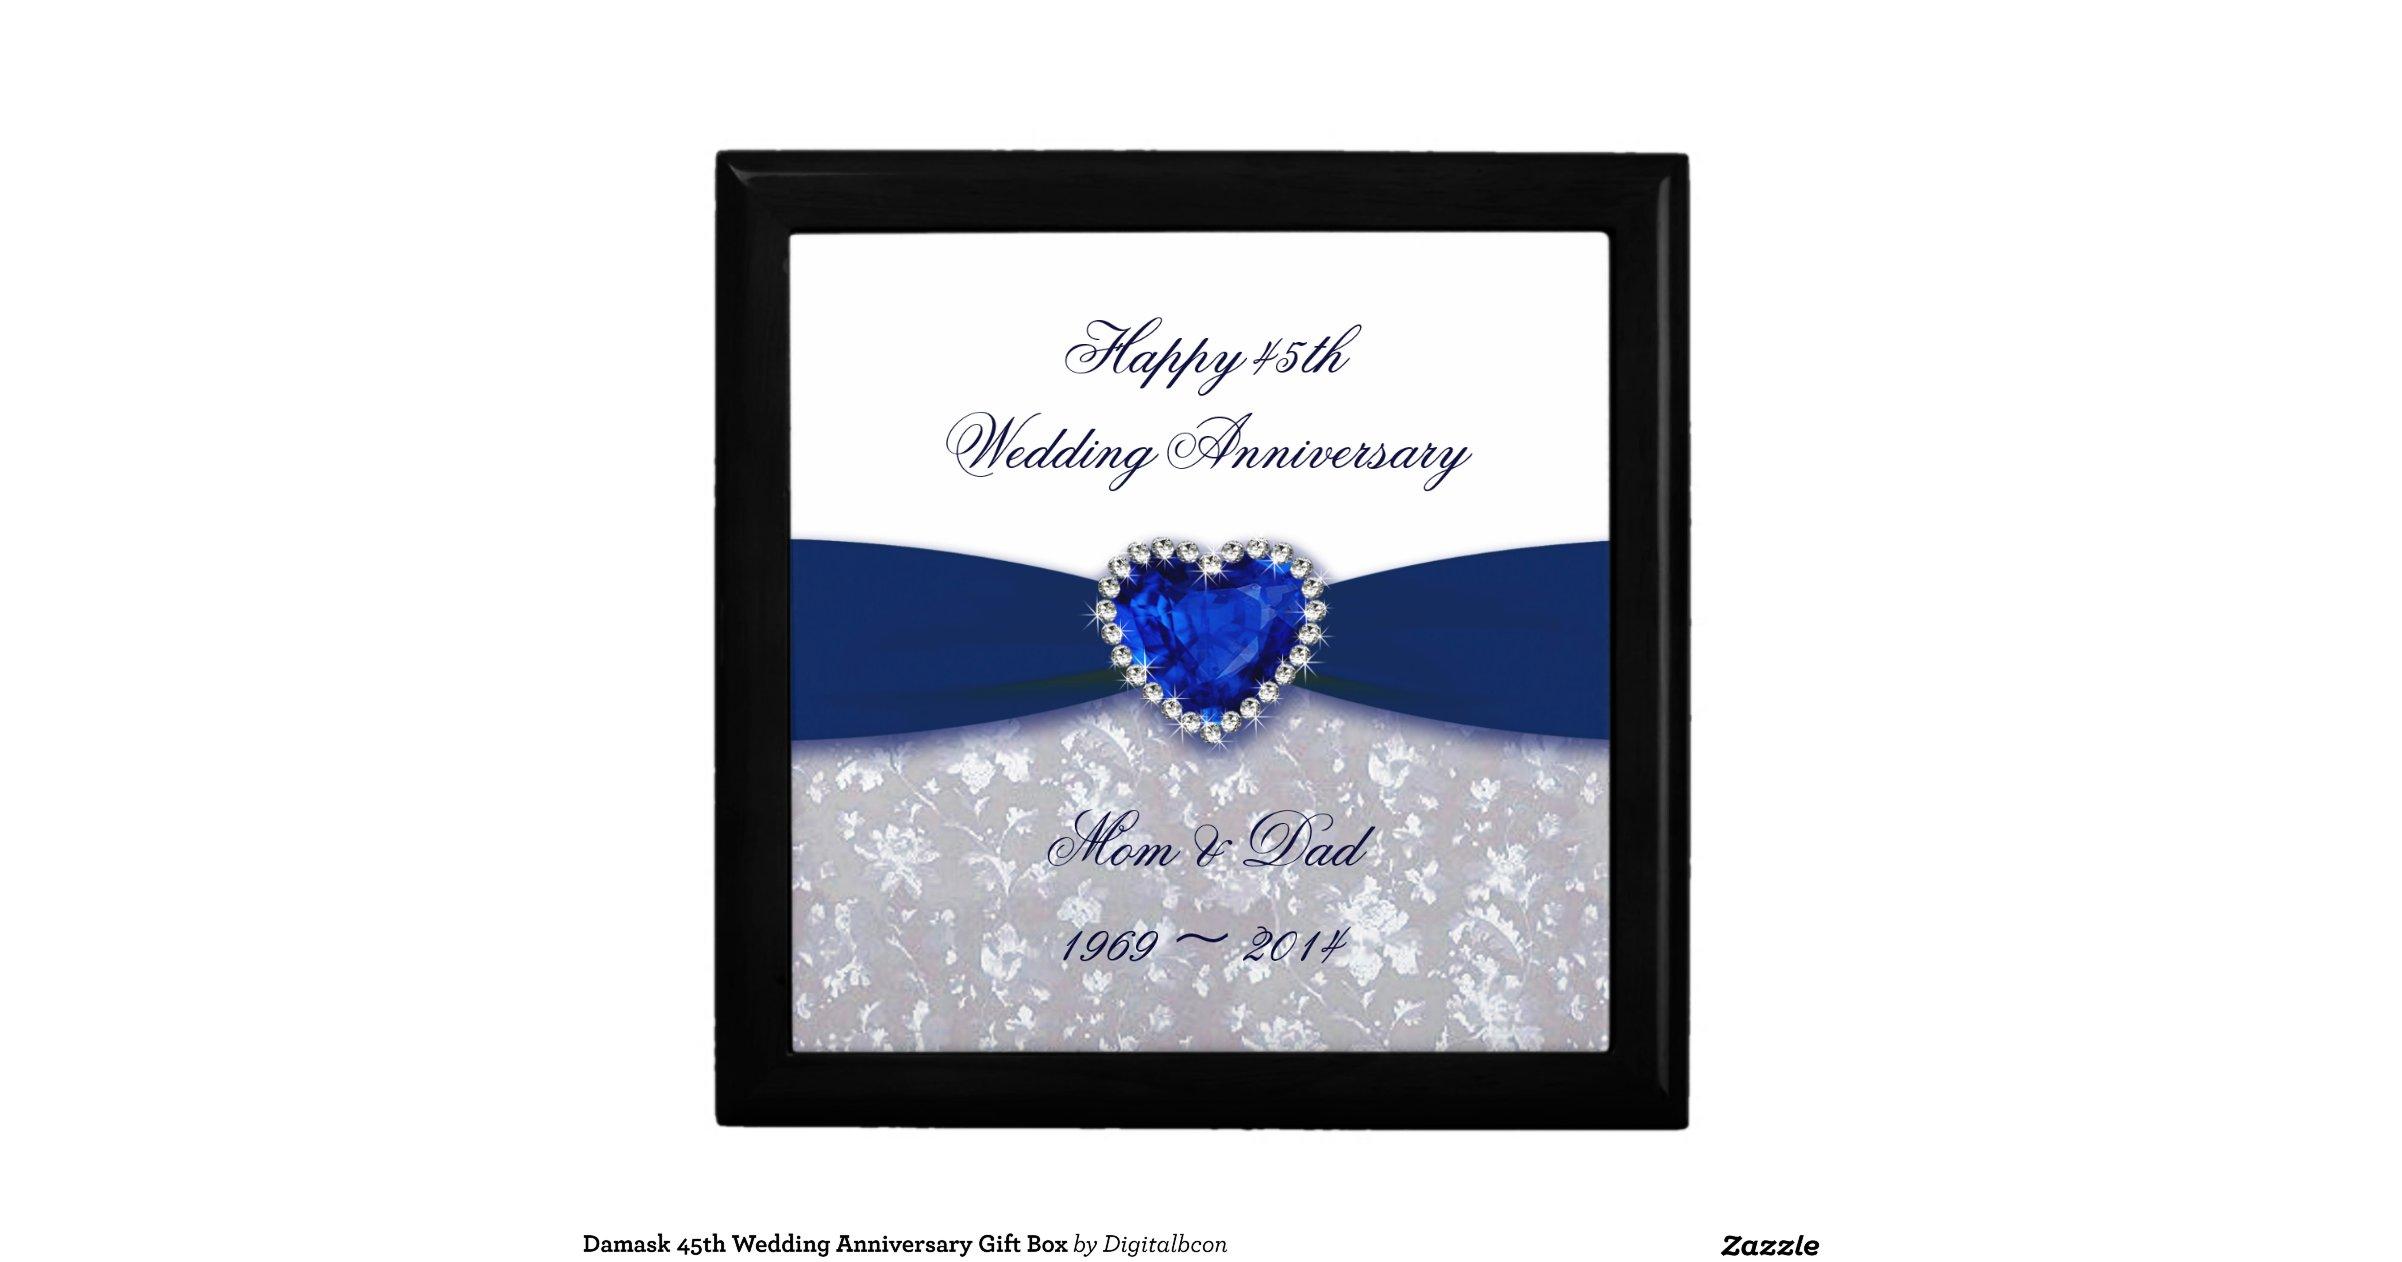 Gifts For 45th Wedding Anniversary: Damask 45th Wedding Anniversary Gift Box